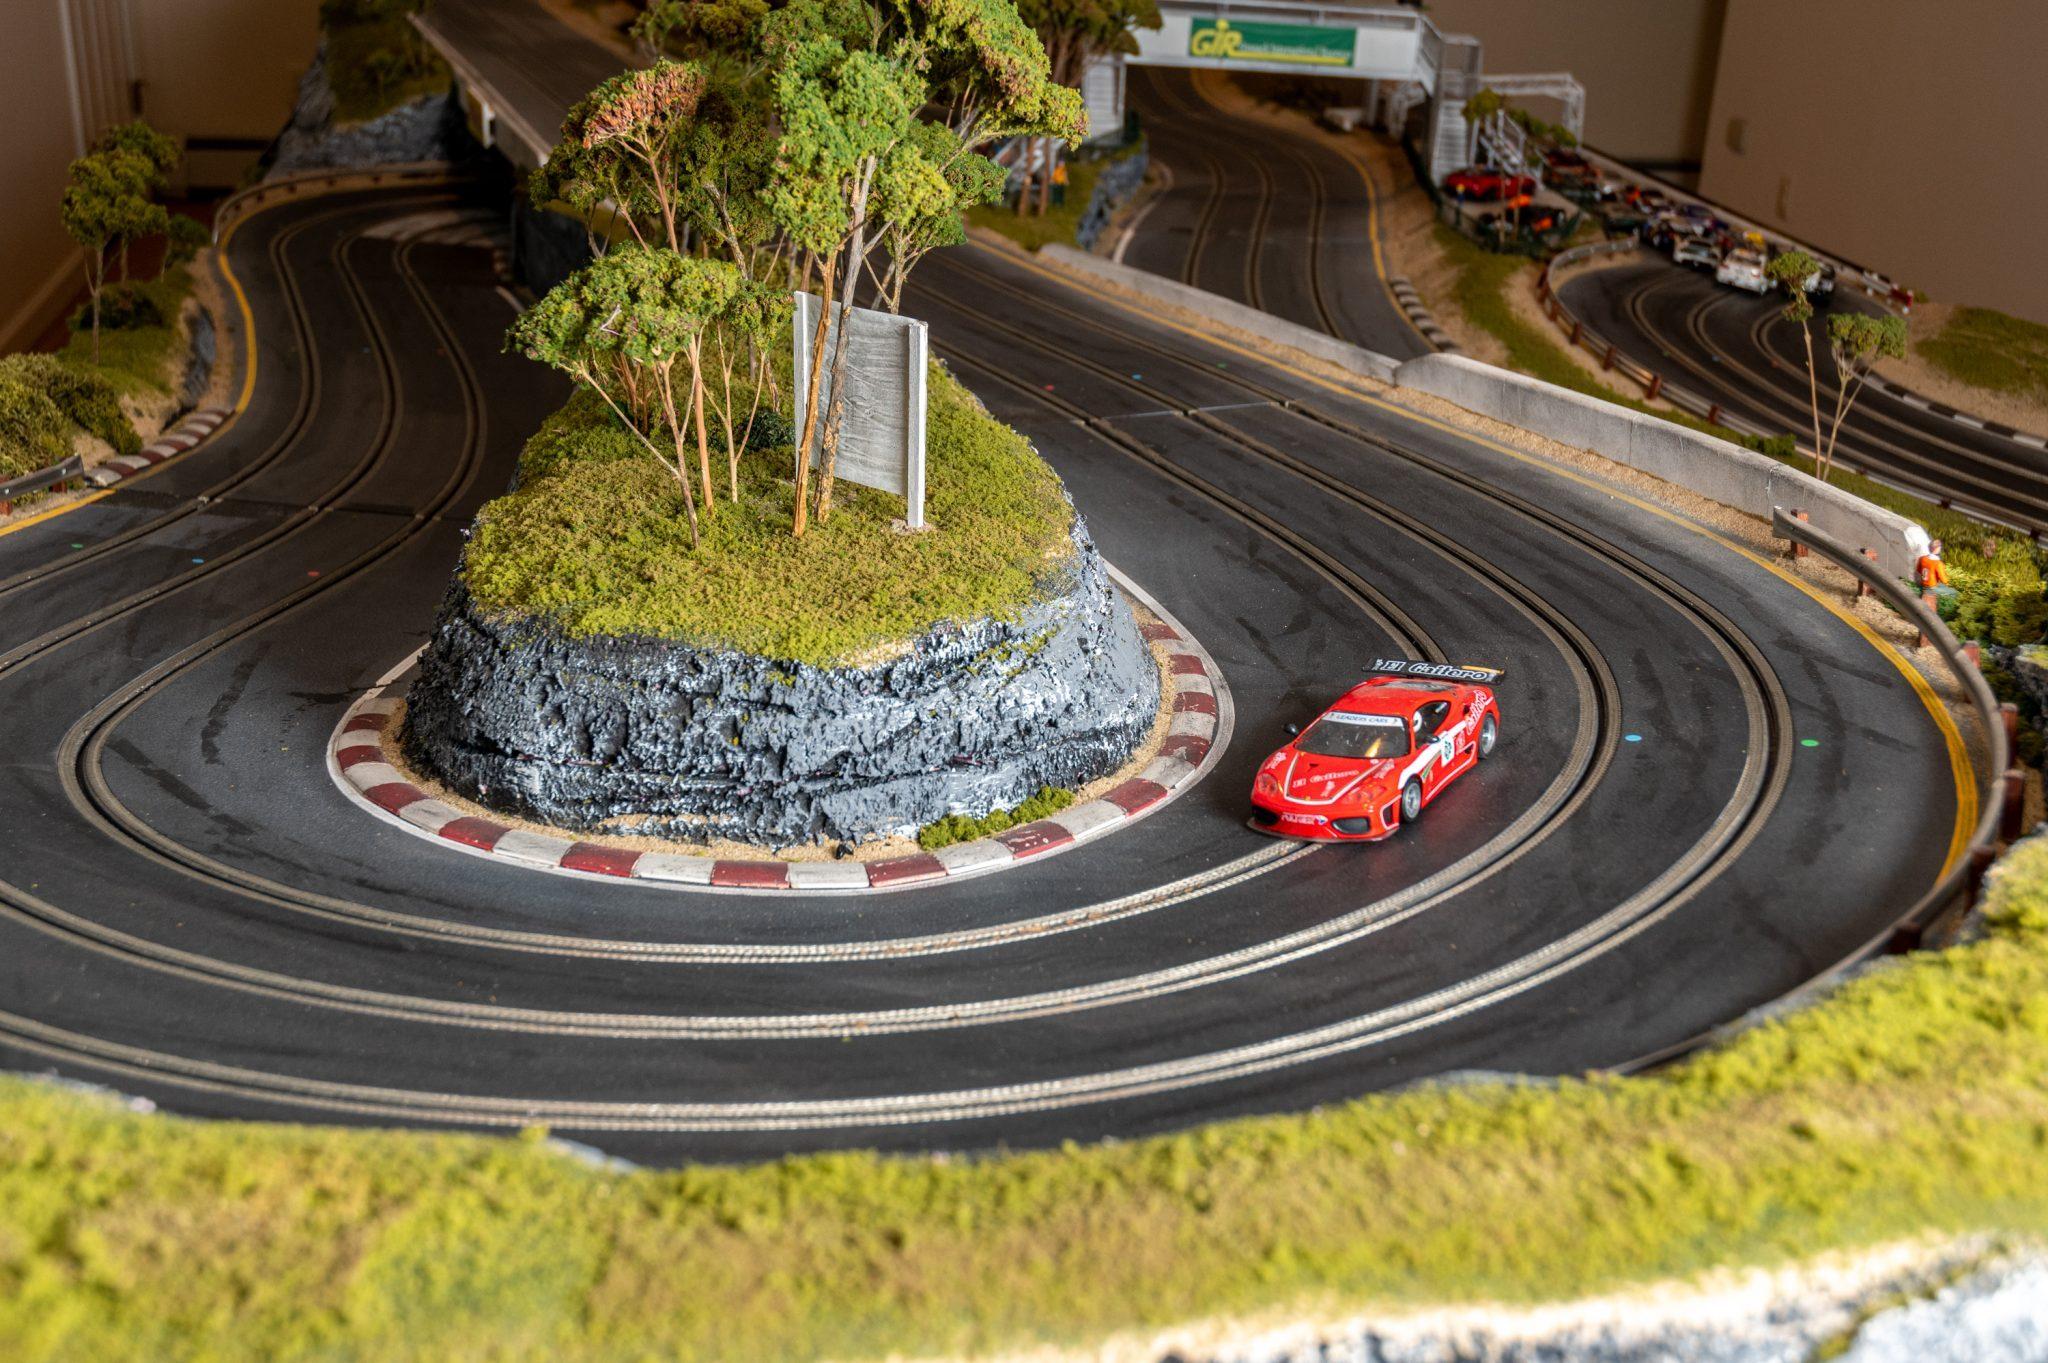 Slot Car Racetrack cornering detail